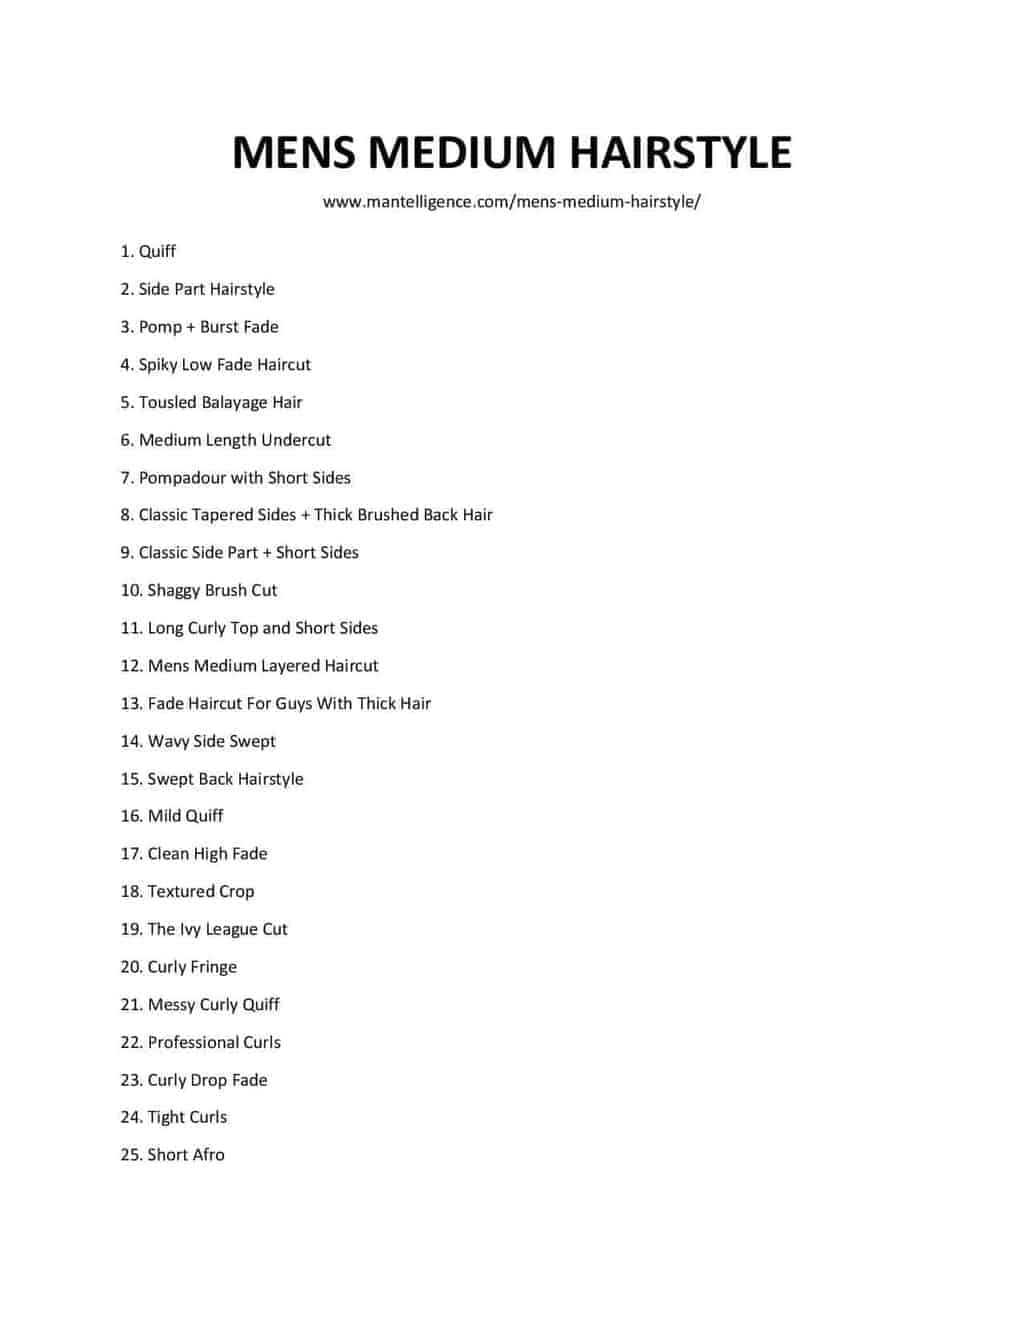 list of MENS MEDIUM HAIRSTYLE (1)